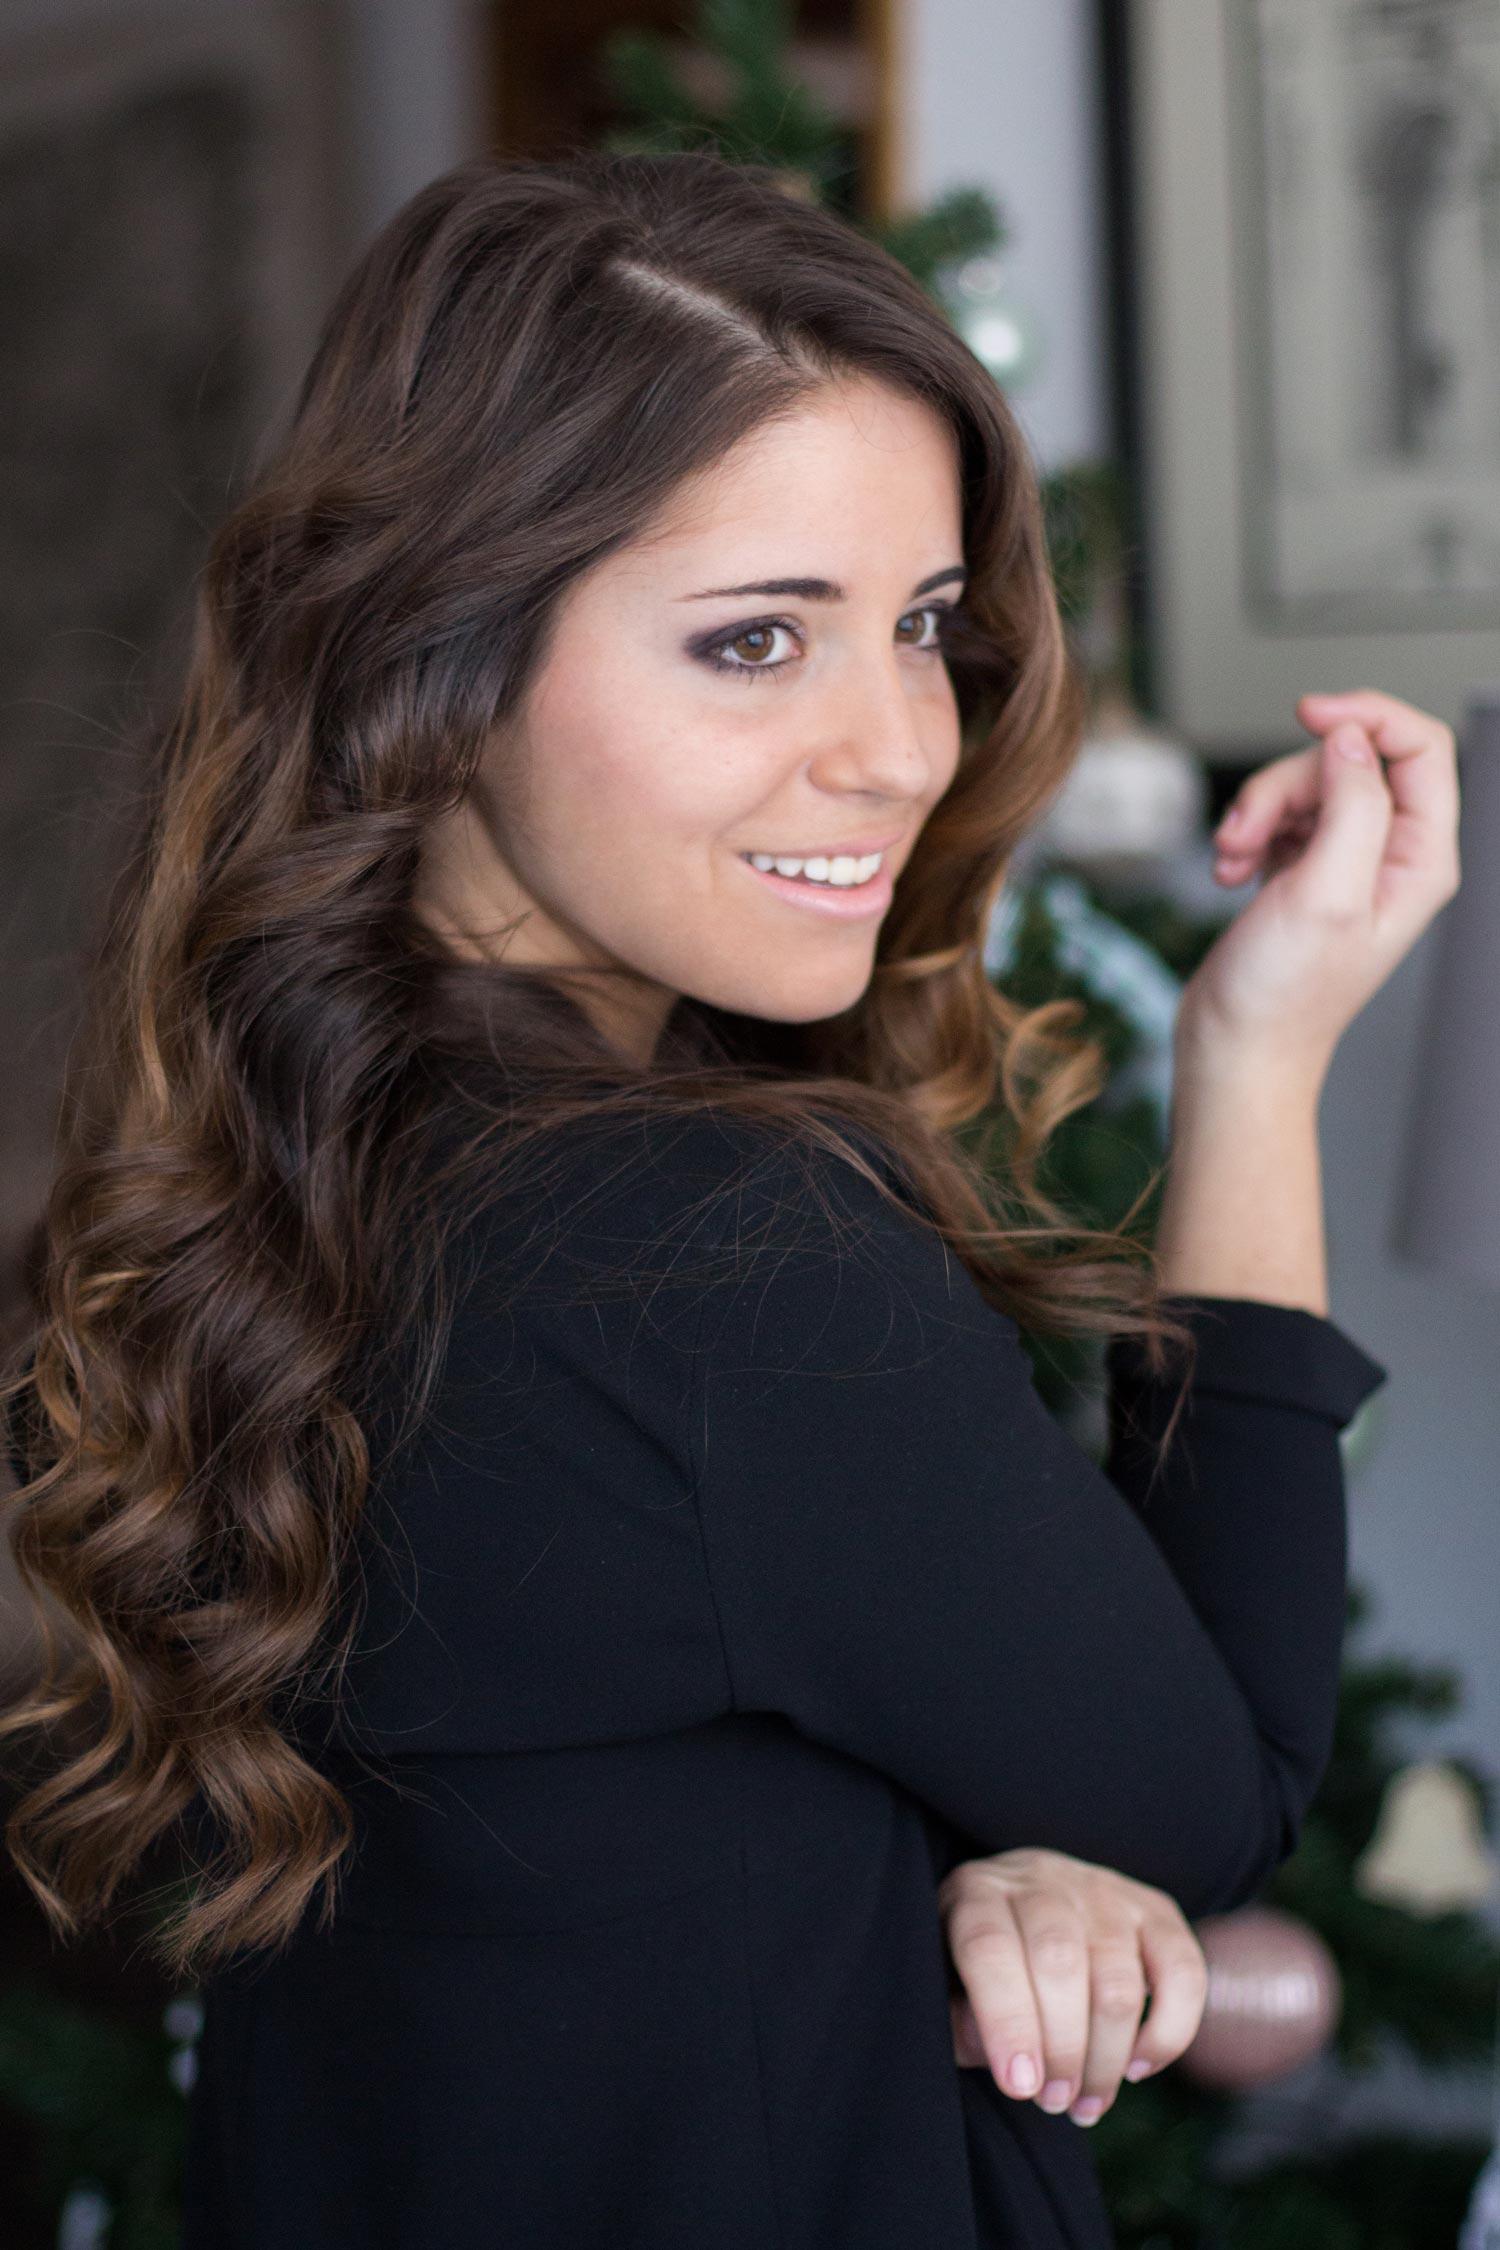 loreto_made_in_style_urvan_beauty_onthe_go_peluqueria_a_domicilio_maquillaje-75